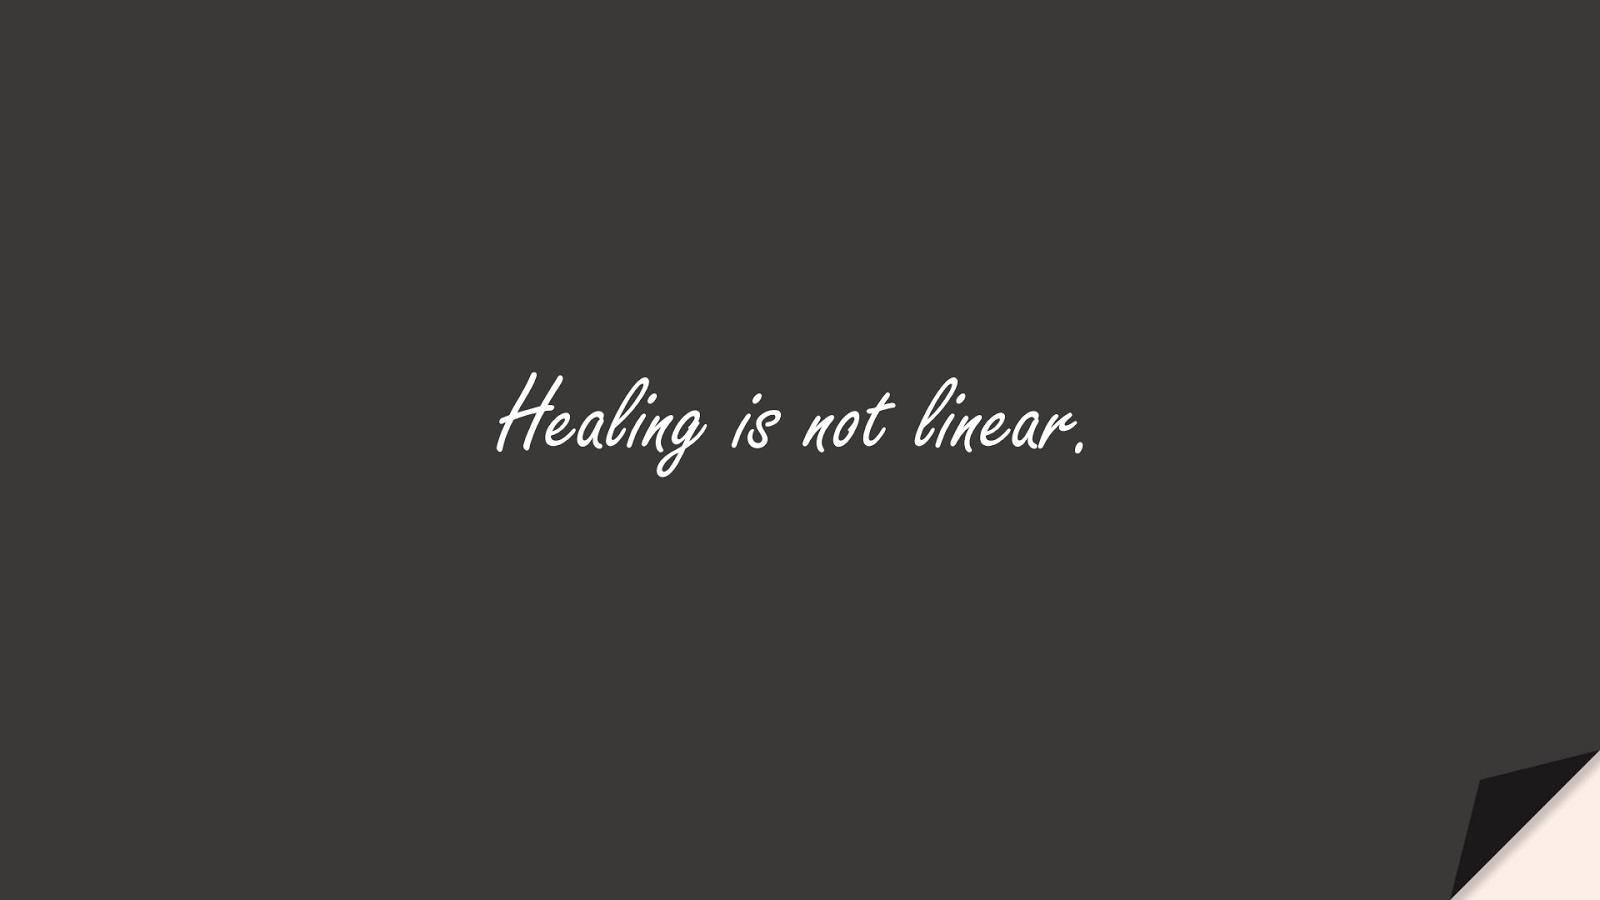 Healing is not linear.FALSE